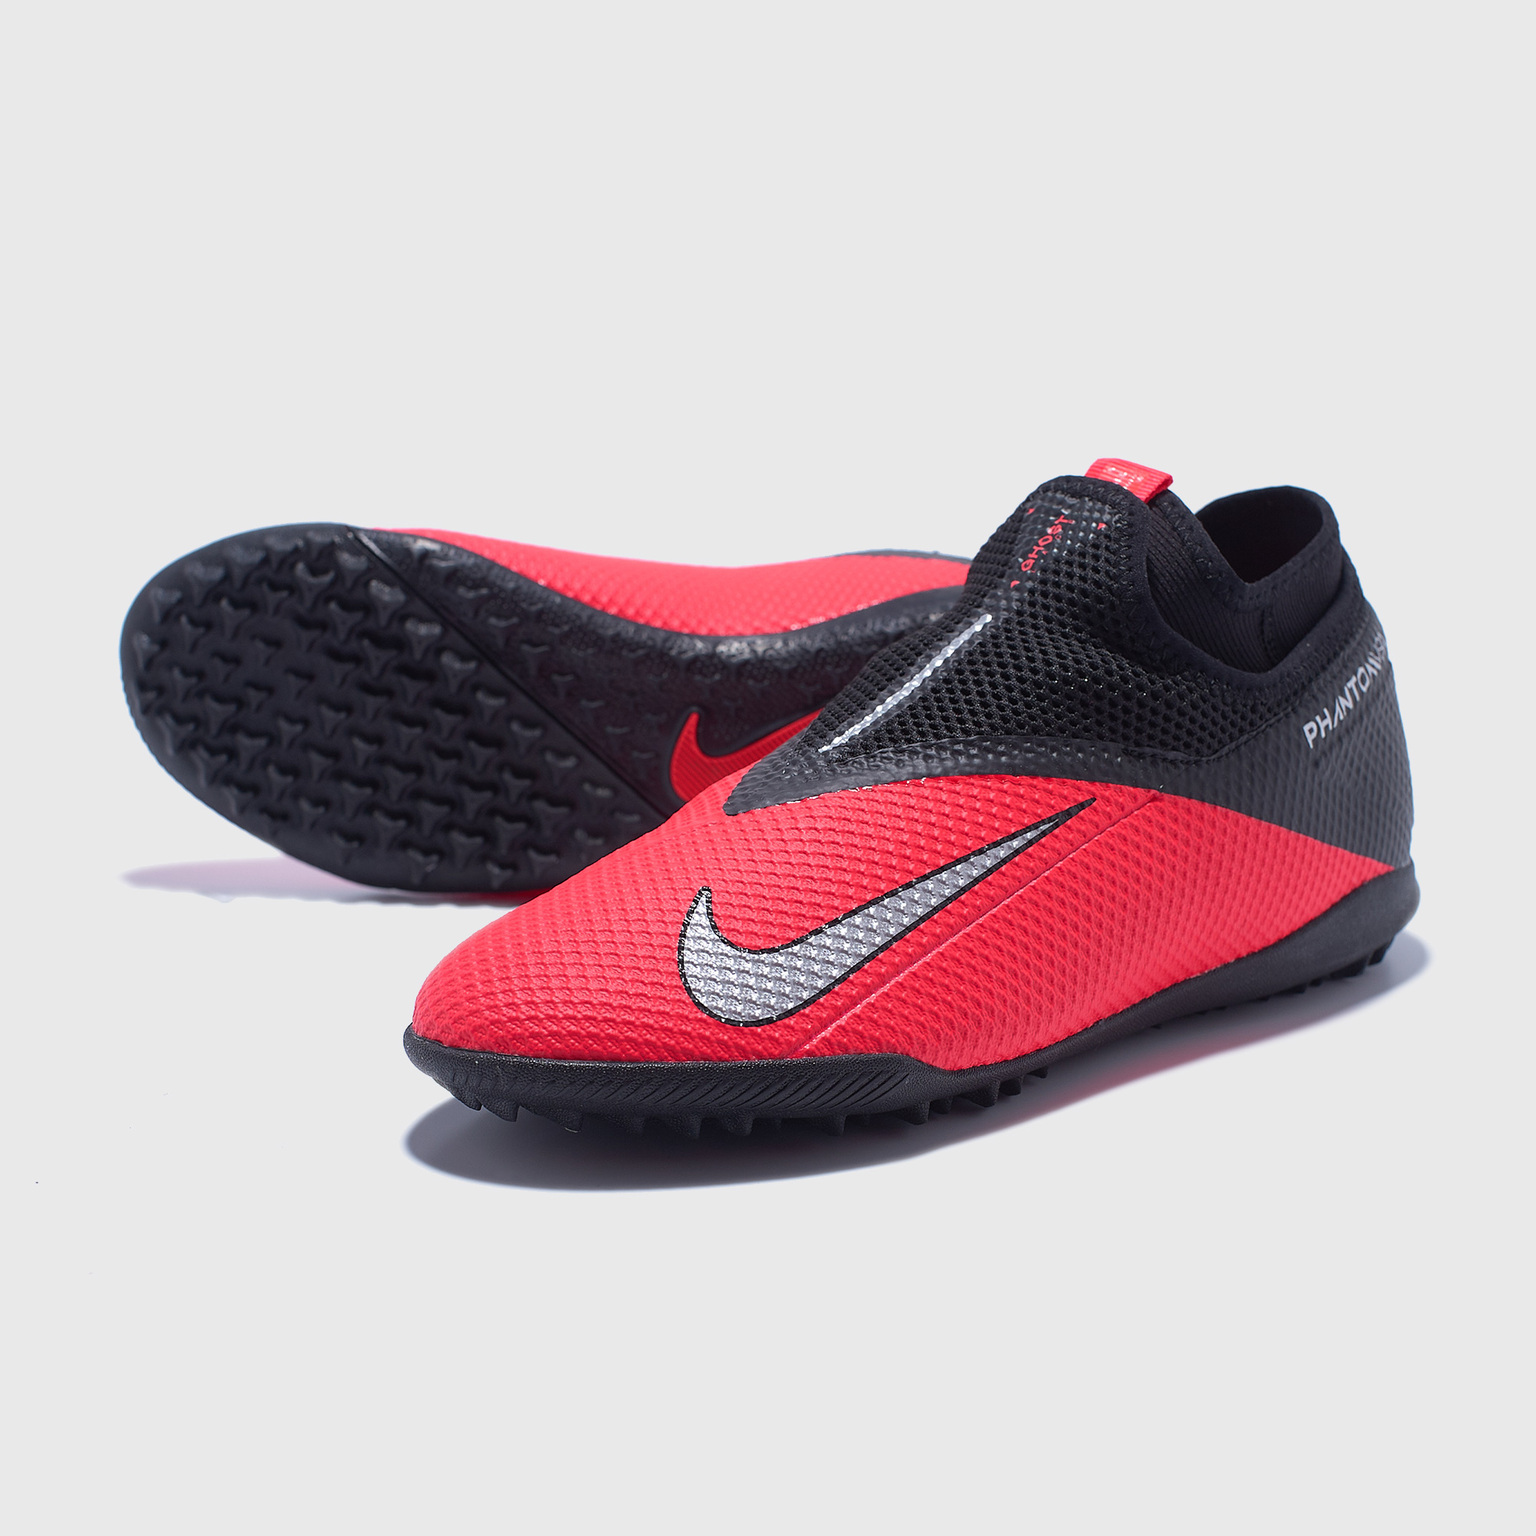 Шиповки Nike Phantom Vision 2 Academy DF TF CD4172-606 шиповки детские nike phantom vision 2 academy df tf cd4078 606